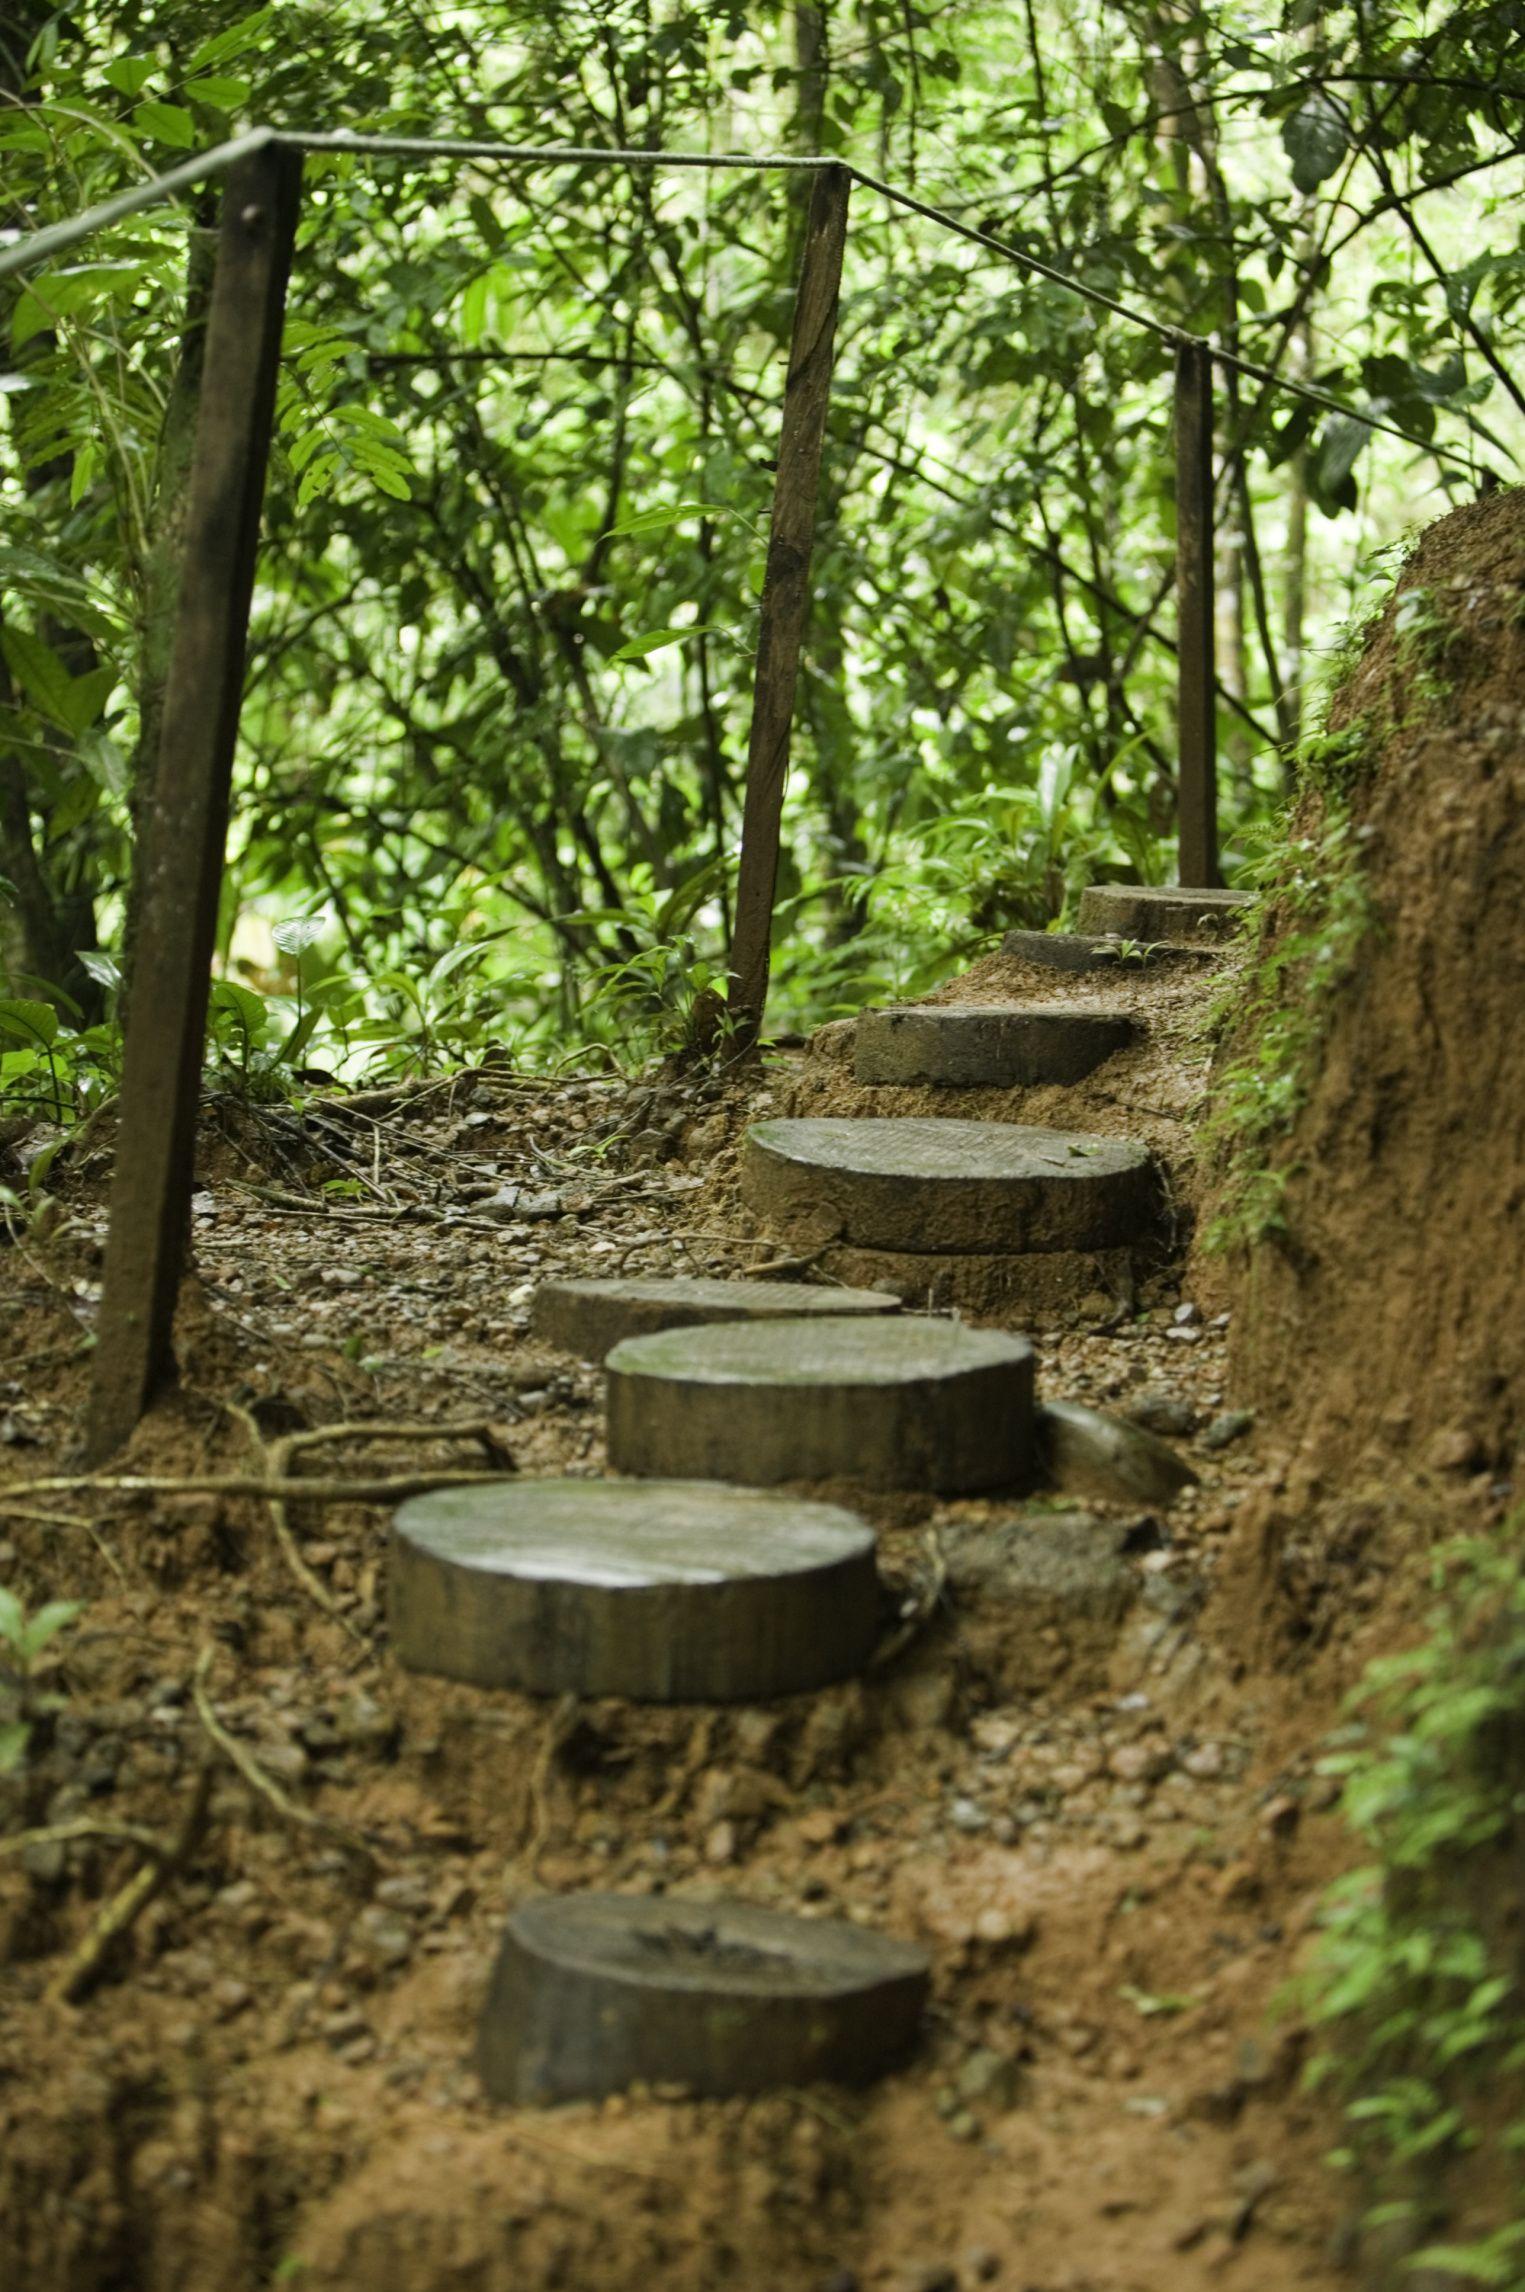 How To Build A Ground Level Wooden Walkway Garden Wooden Pathway